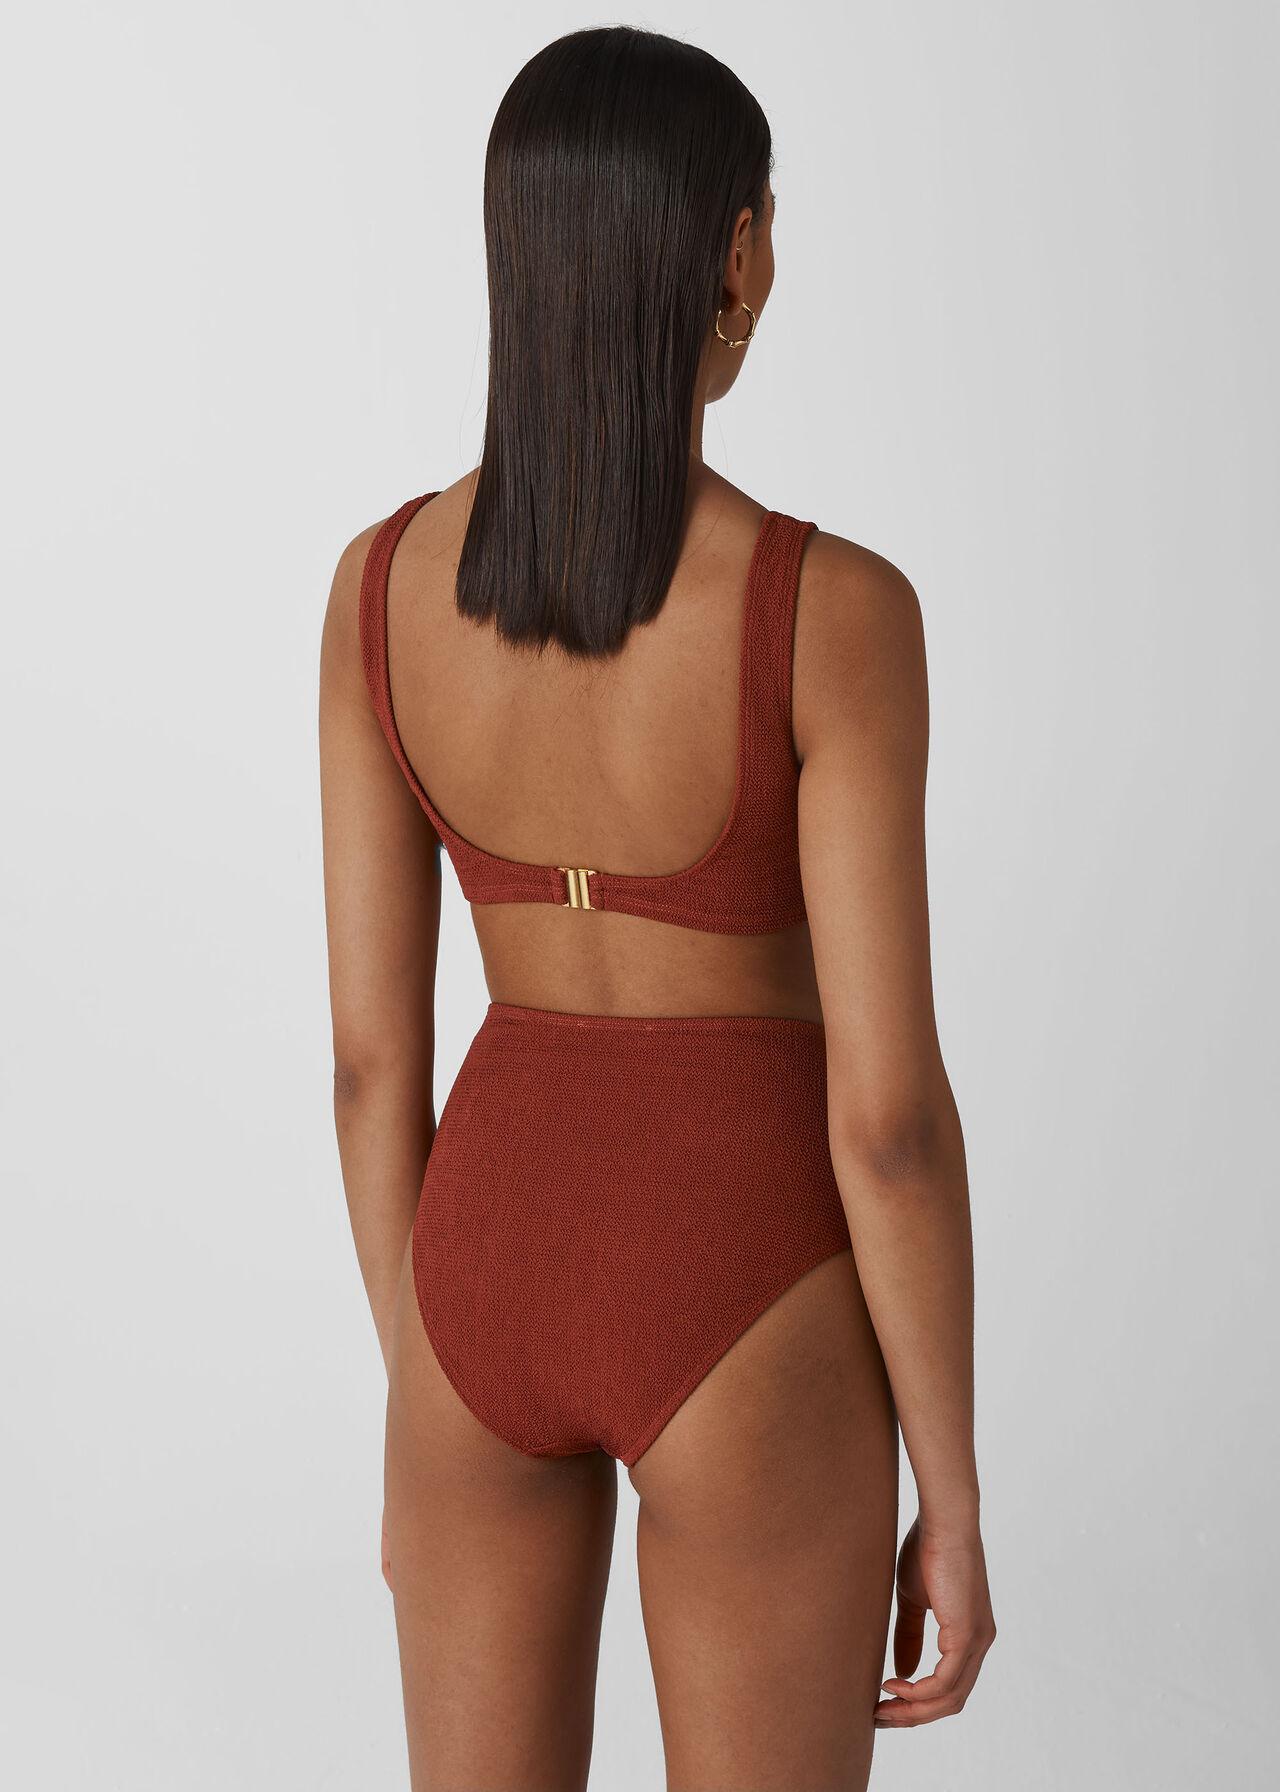 Tort Ring Square Bikini Top Rust